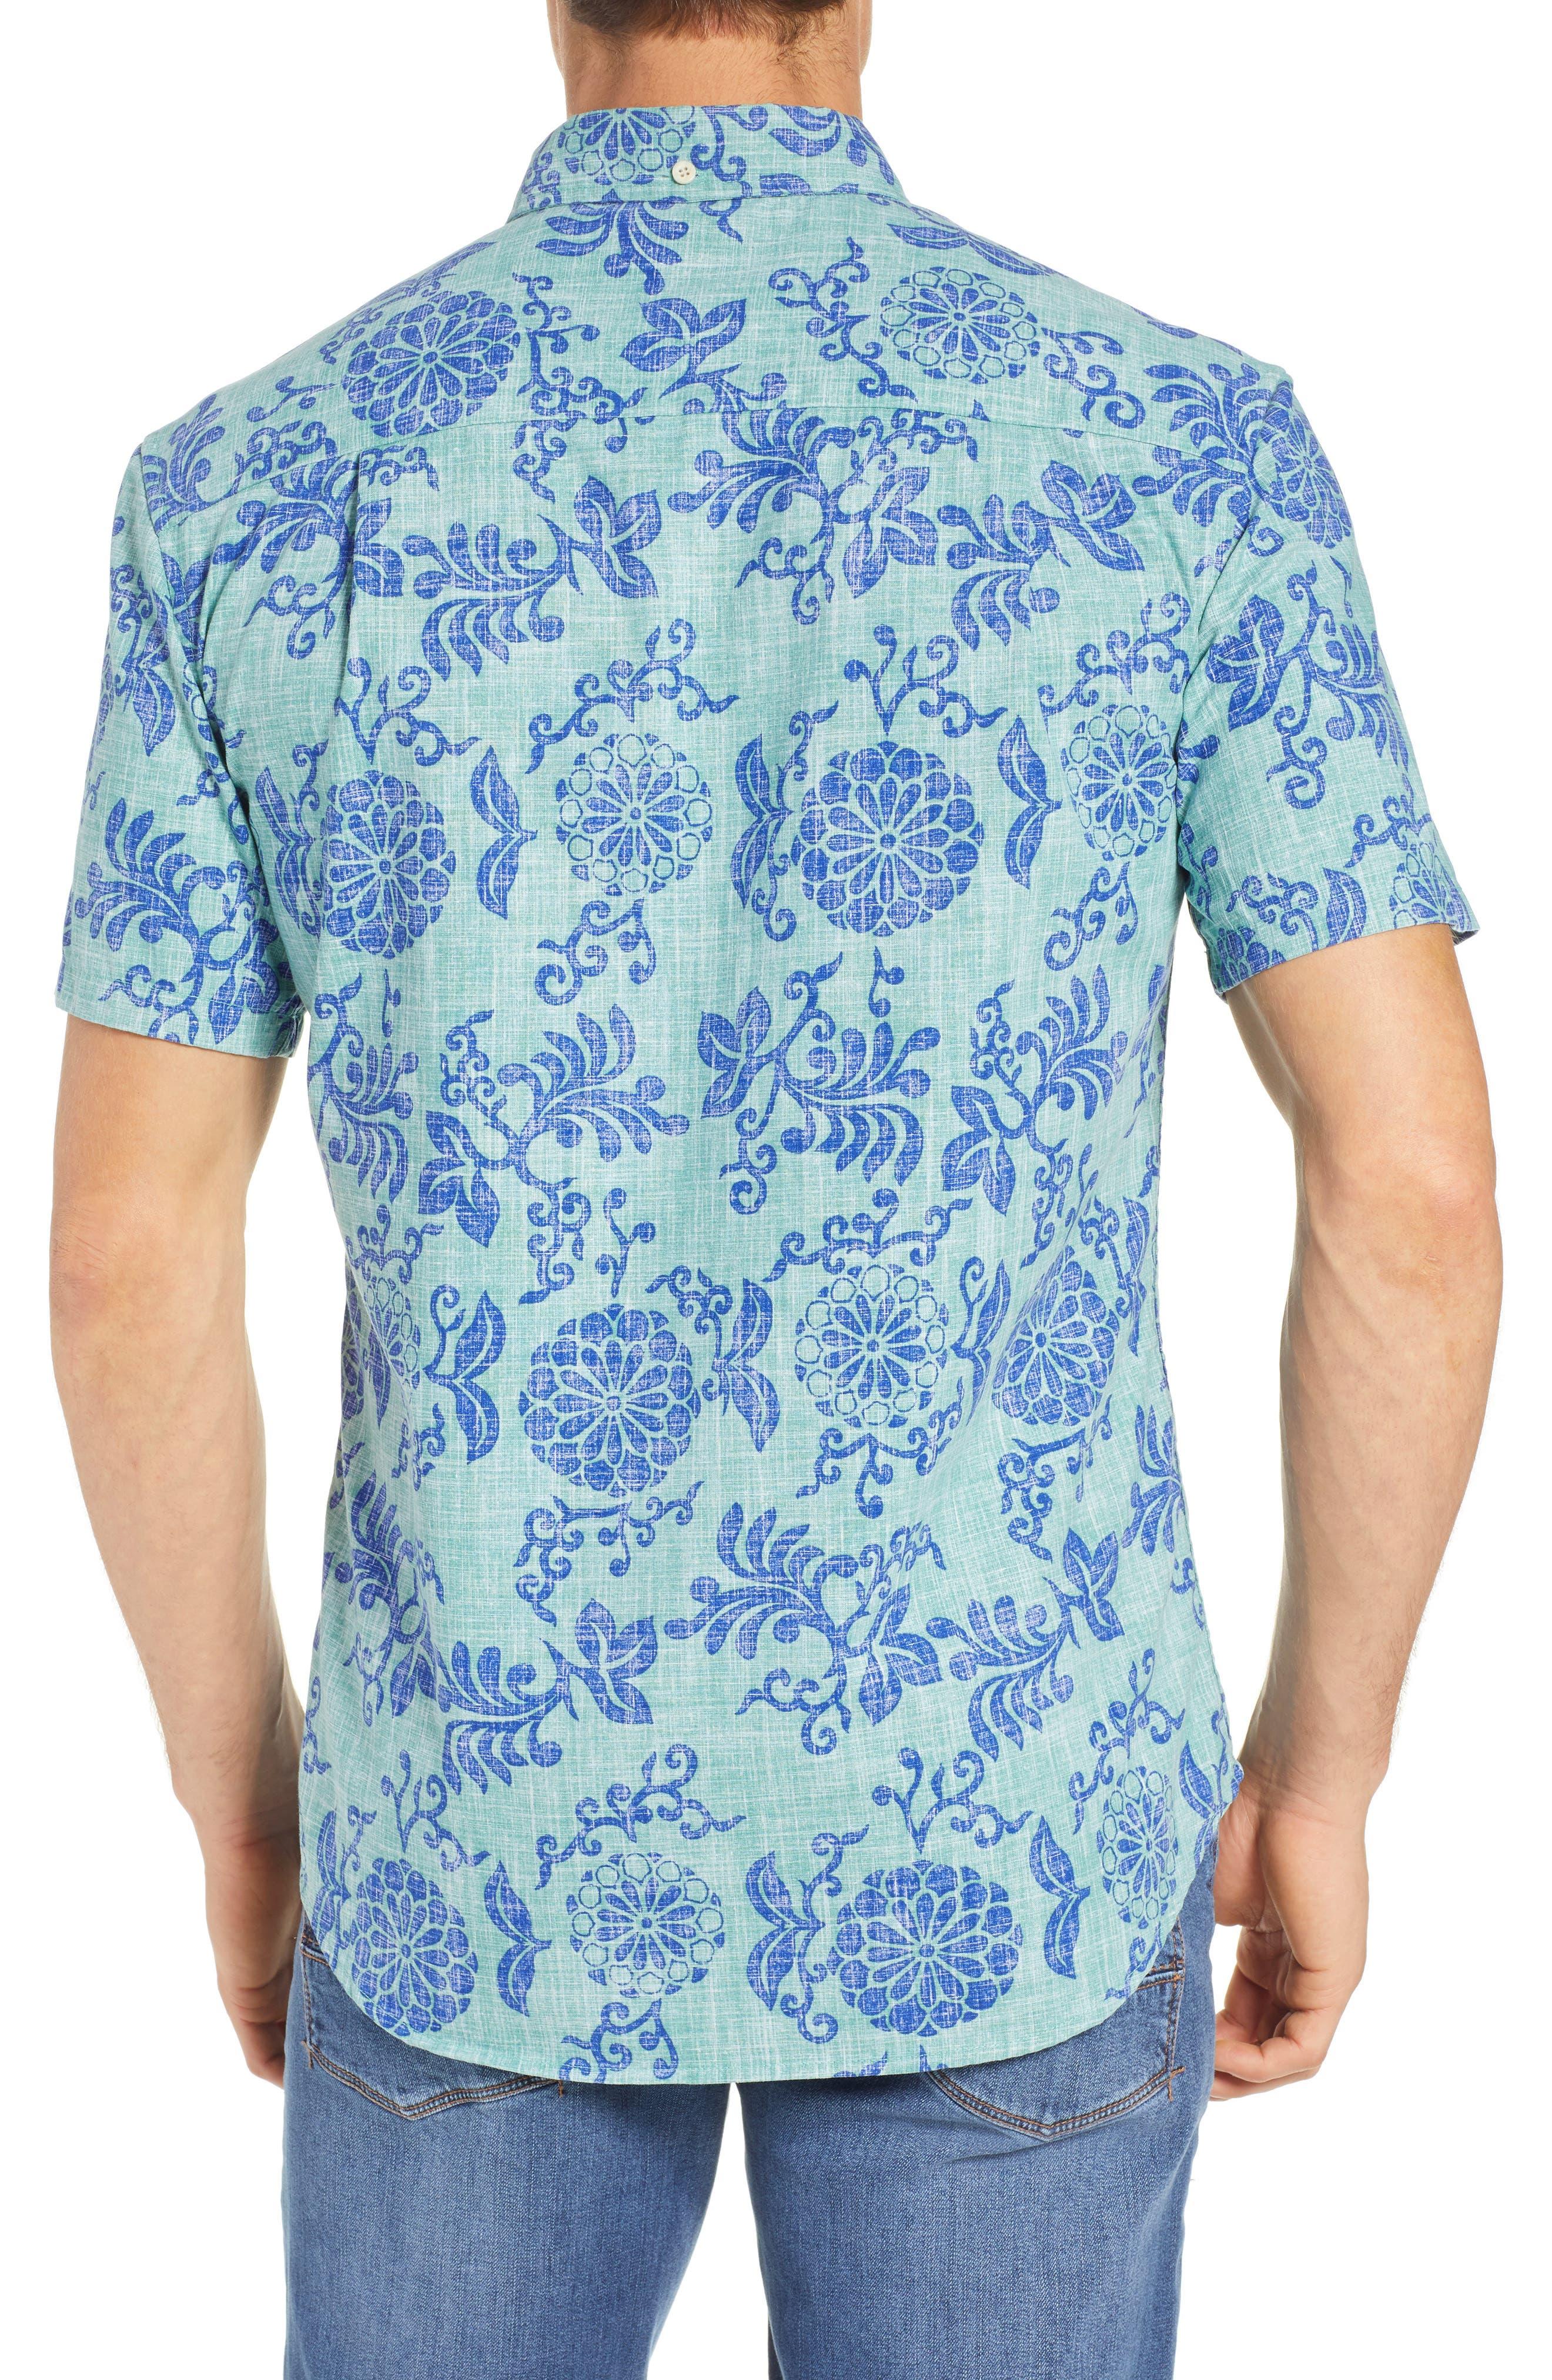 REYN SPOONER, Royal Chrysanthemums Regular Fit Sport Shirt, Alternate thumbnail 3, color, 310